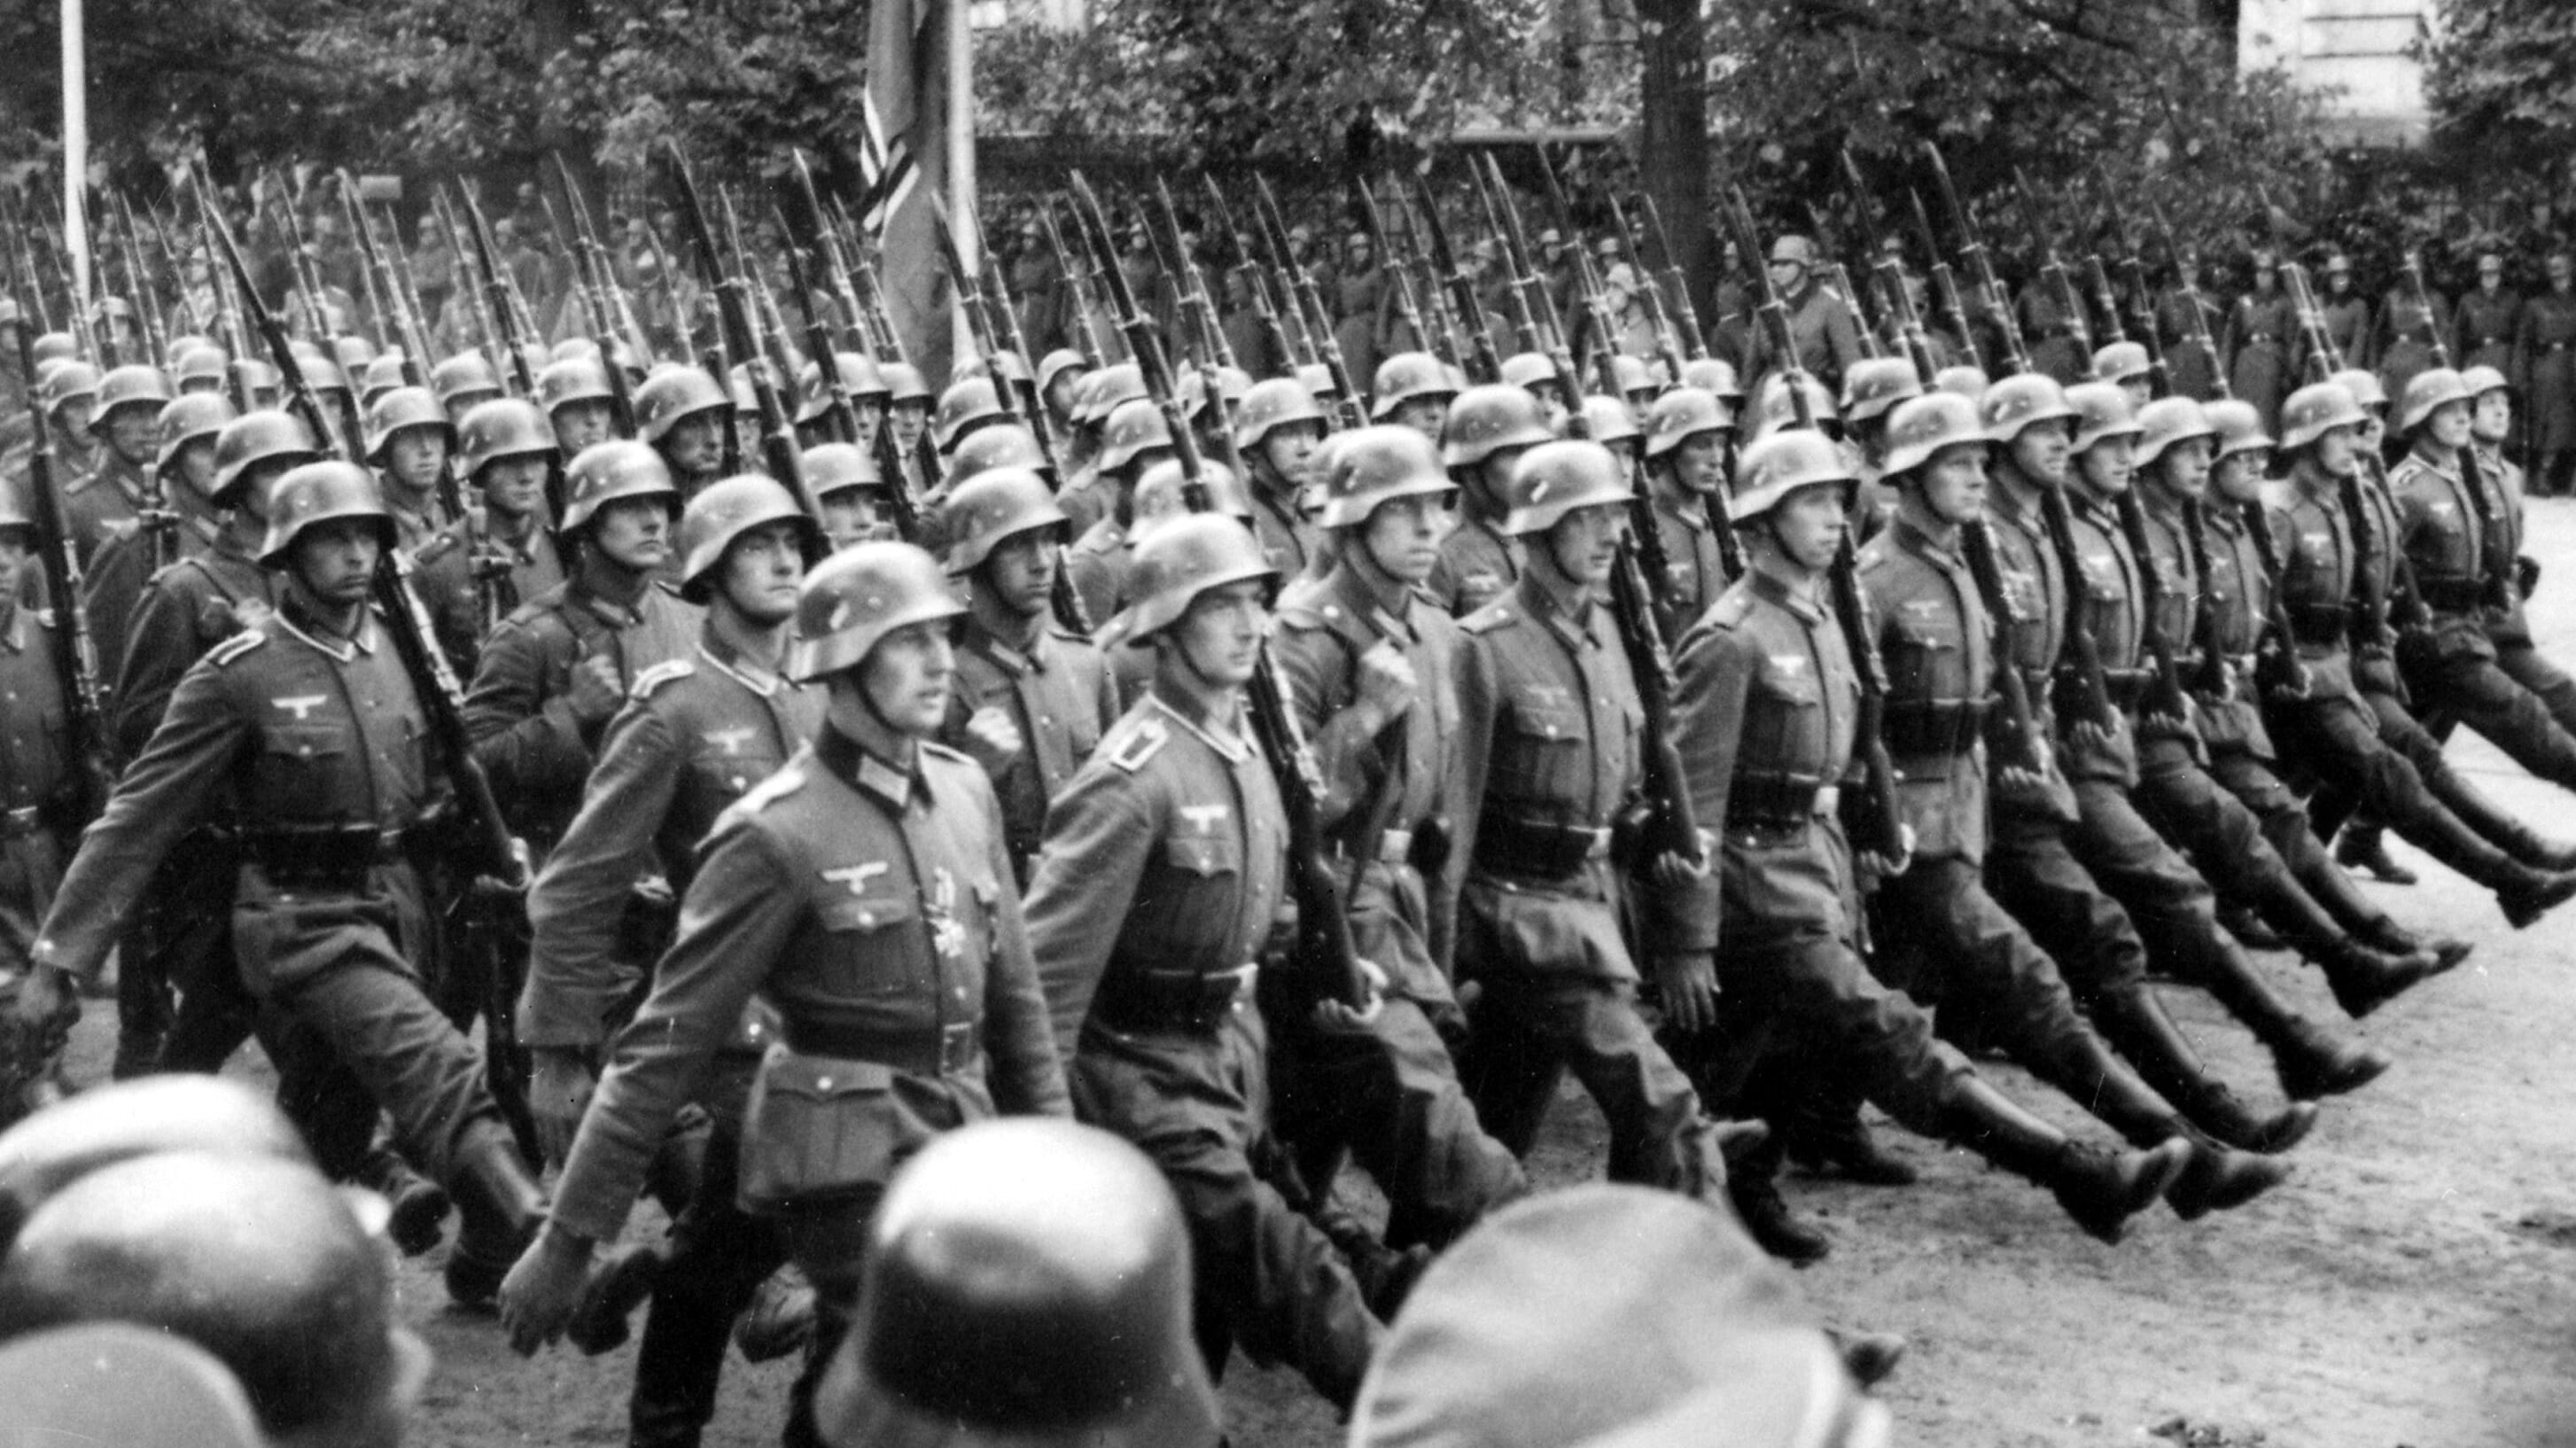 U nedjelju strijeljanje stoko German_troops_parade_through_Warsaw_Poland_09-1939_-_NARA_-_559369